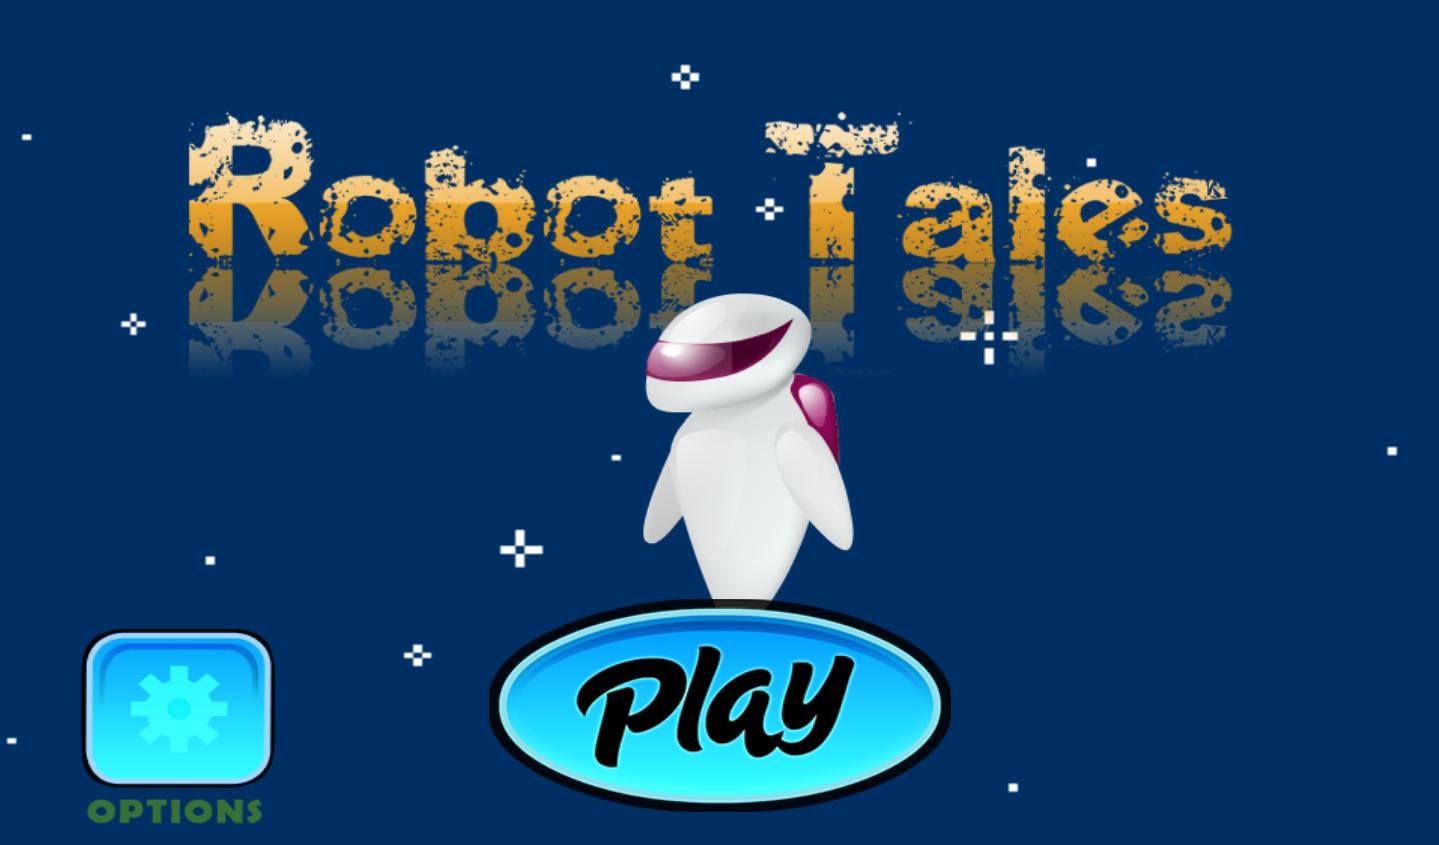 Robot Tales